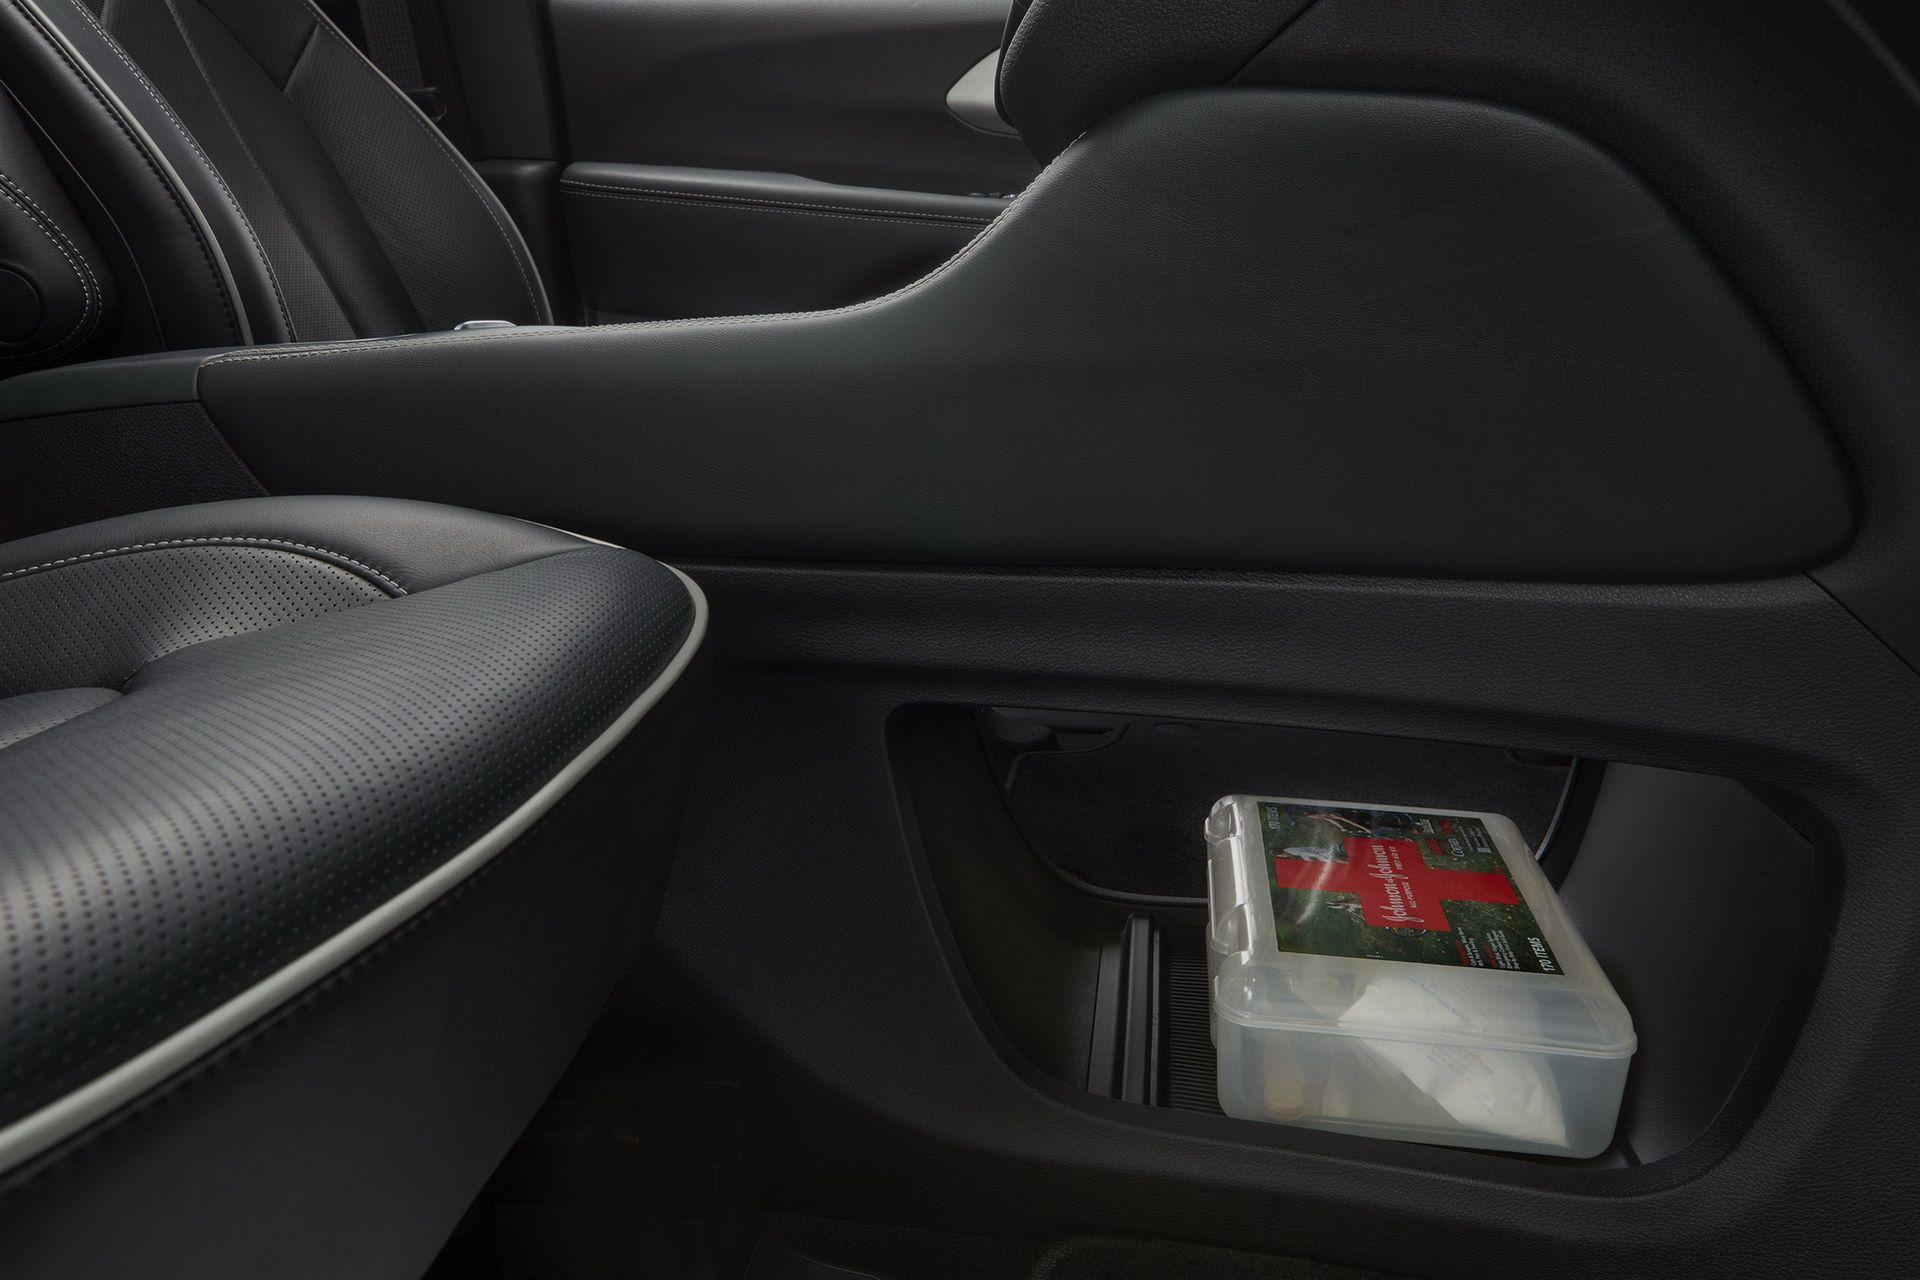 2021-Chrysler-Pacifica-136